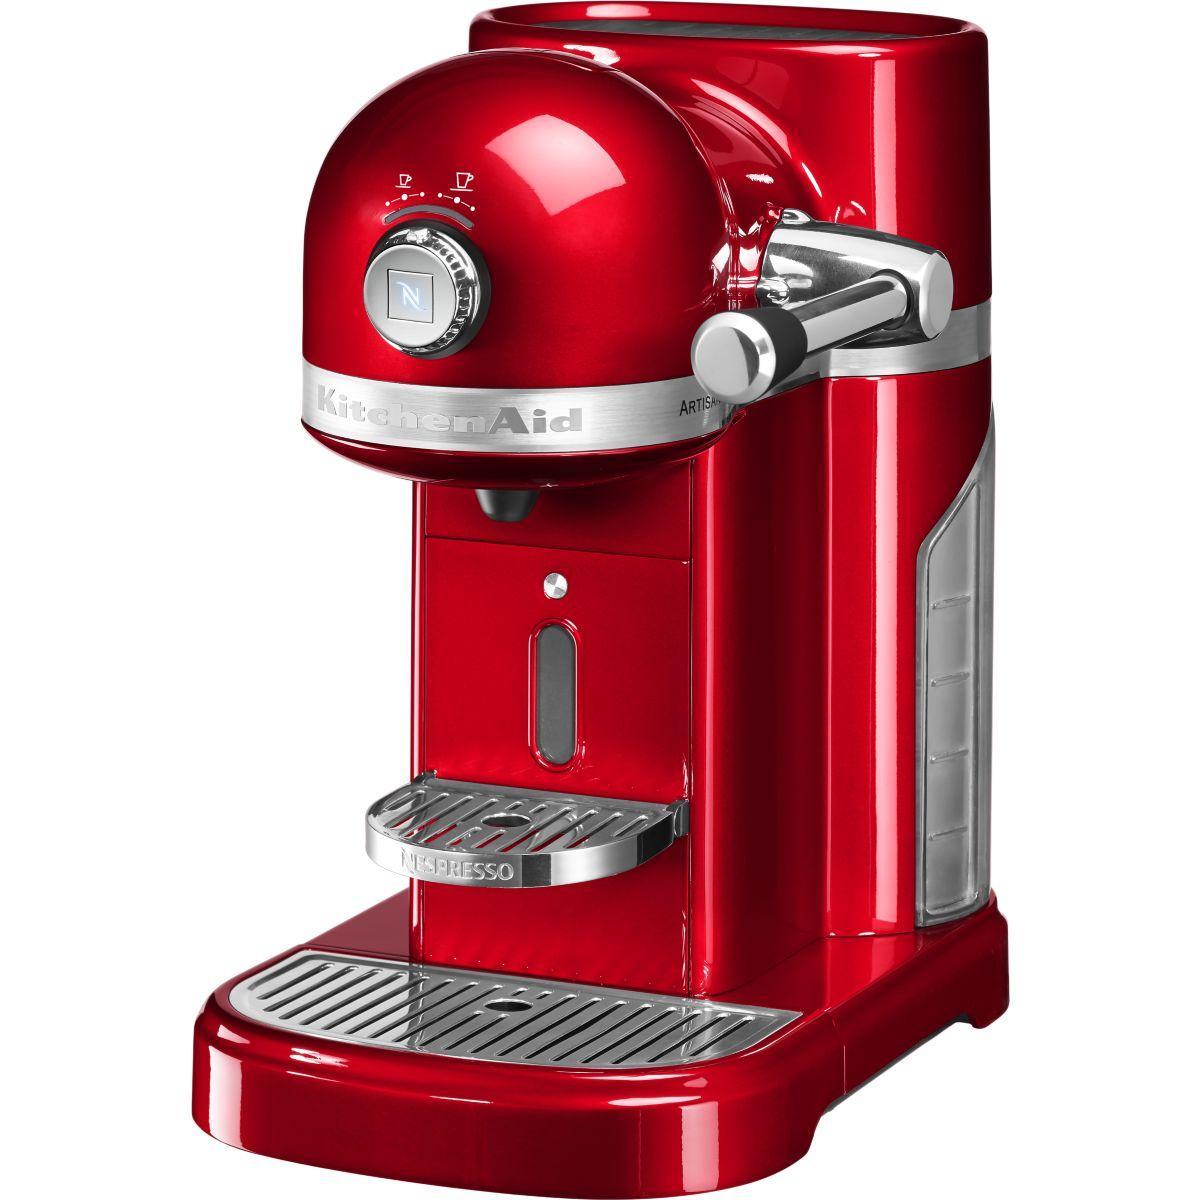 Nespresso kitchenaid 5kes0503eer/5 rouge empire - livraison offerte : code premium (photo)